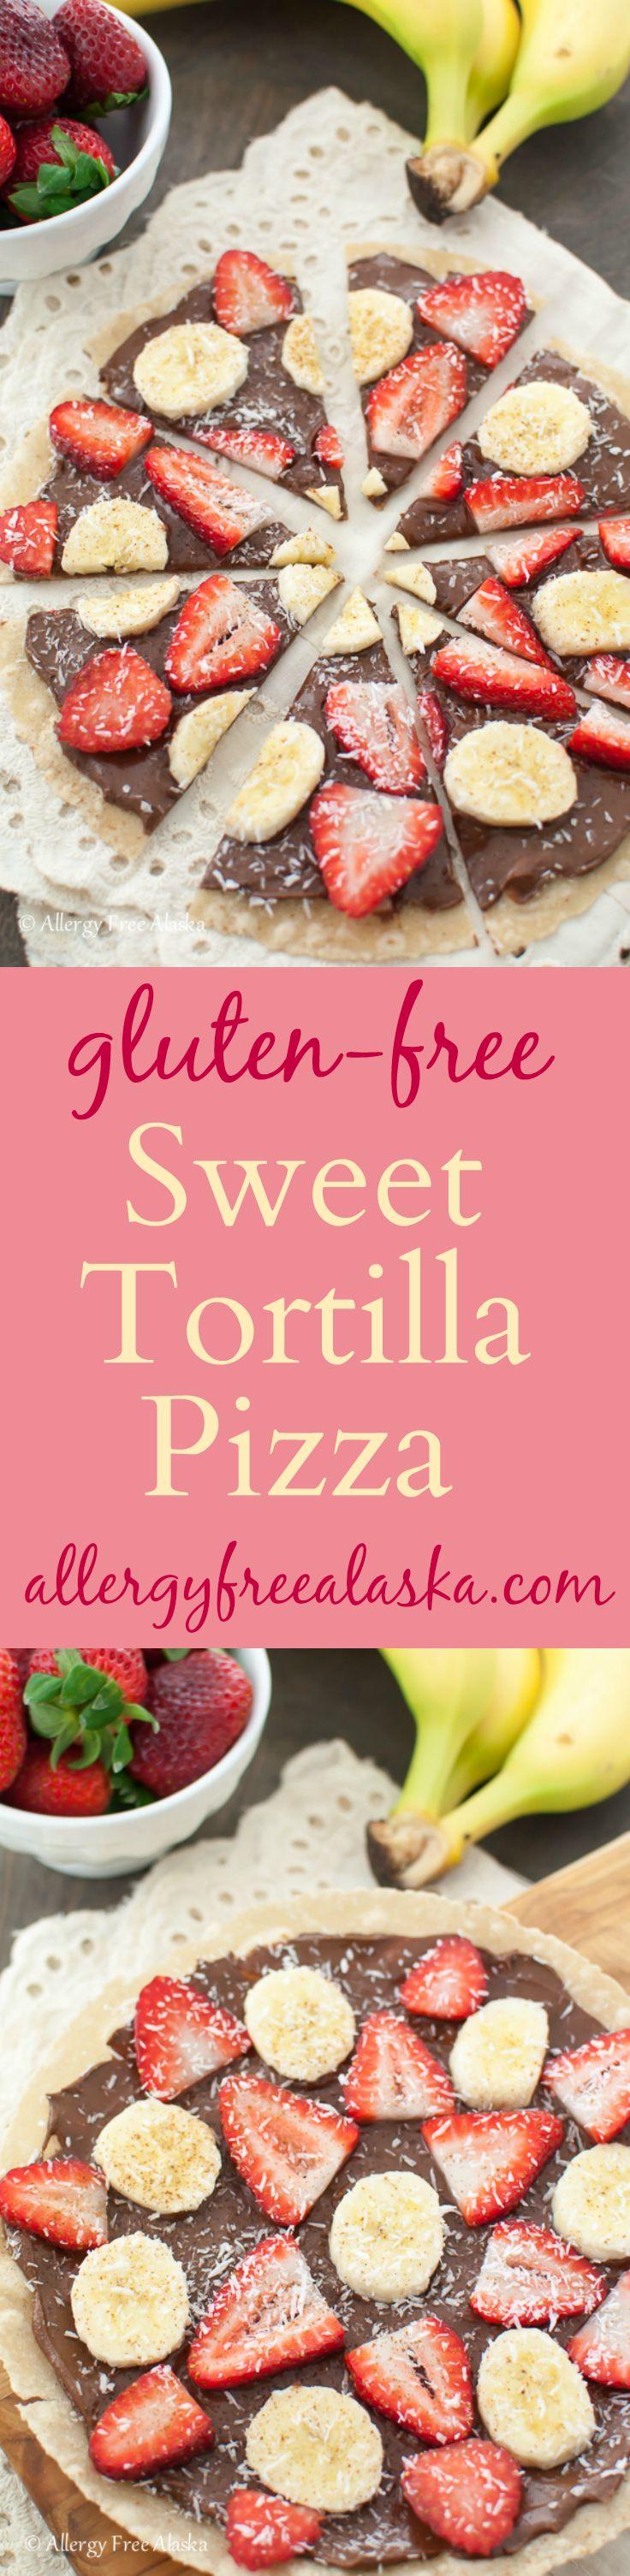 Gluten Free Sweet Tortilla Pizza from Allergy Free Alaska